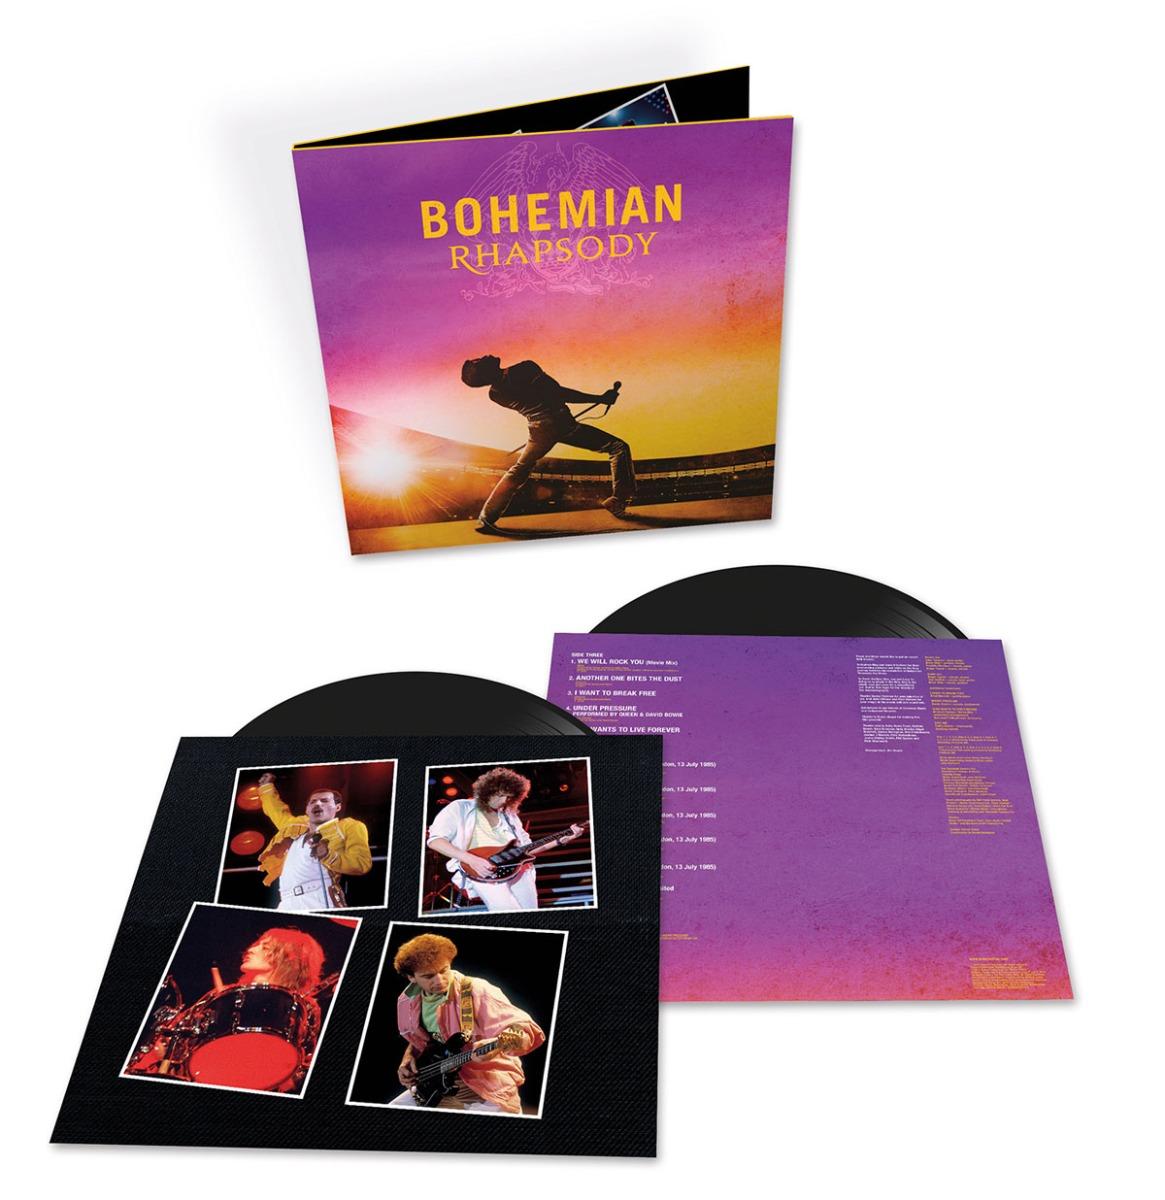 Bohemian Rhapsody Queen - Original Sound Tracks